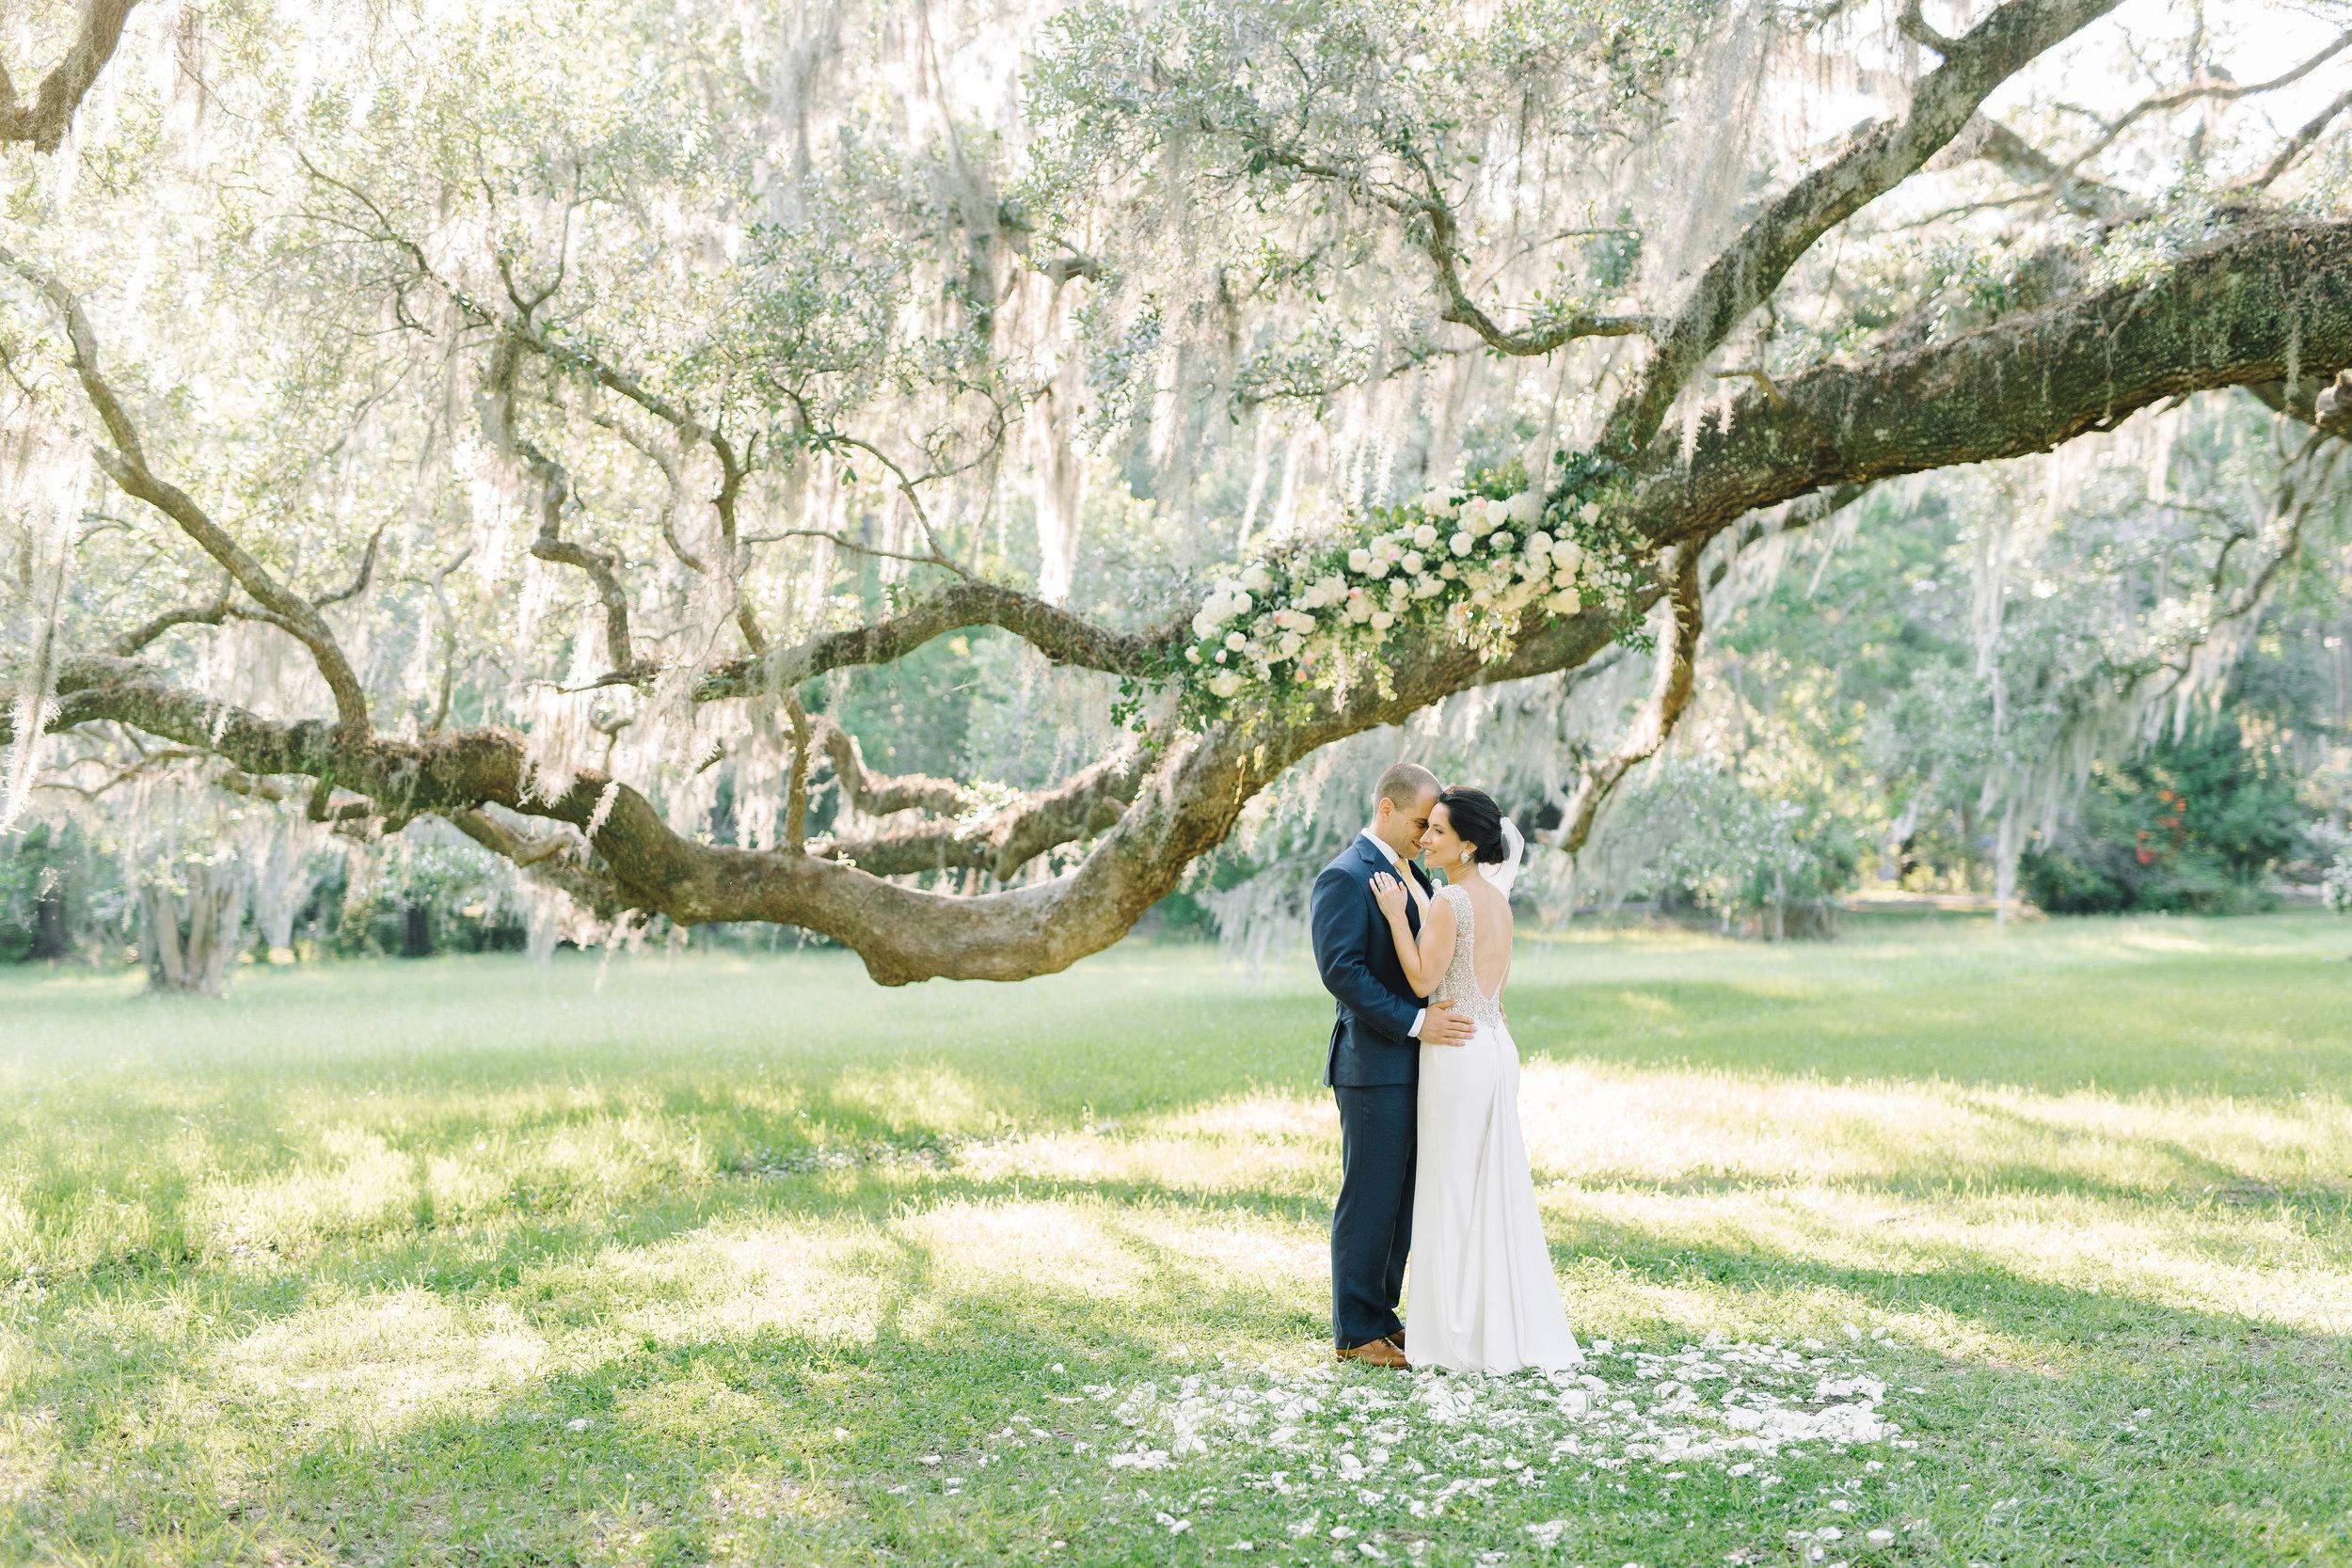 Kristina+Owen-MagnoliaPlantationWeddingbyAaronandJillianPhotography-348.jpg